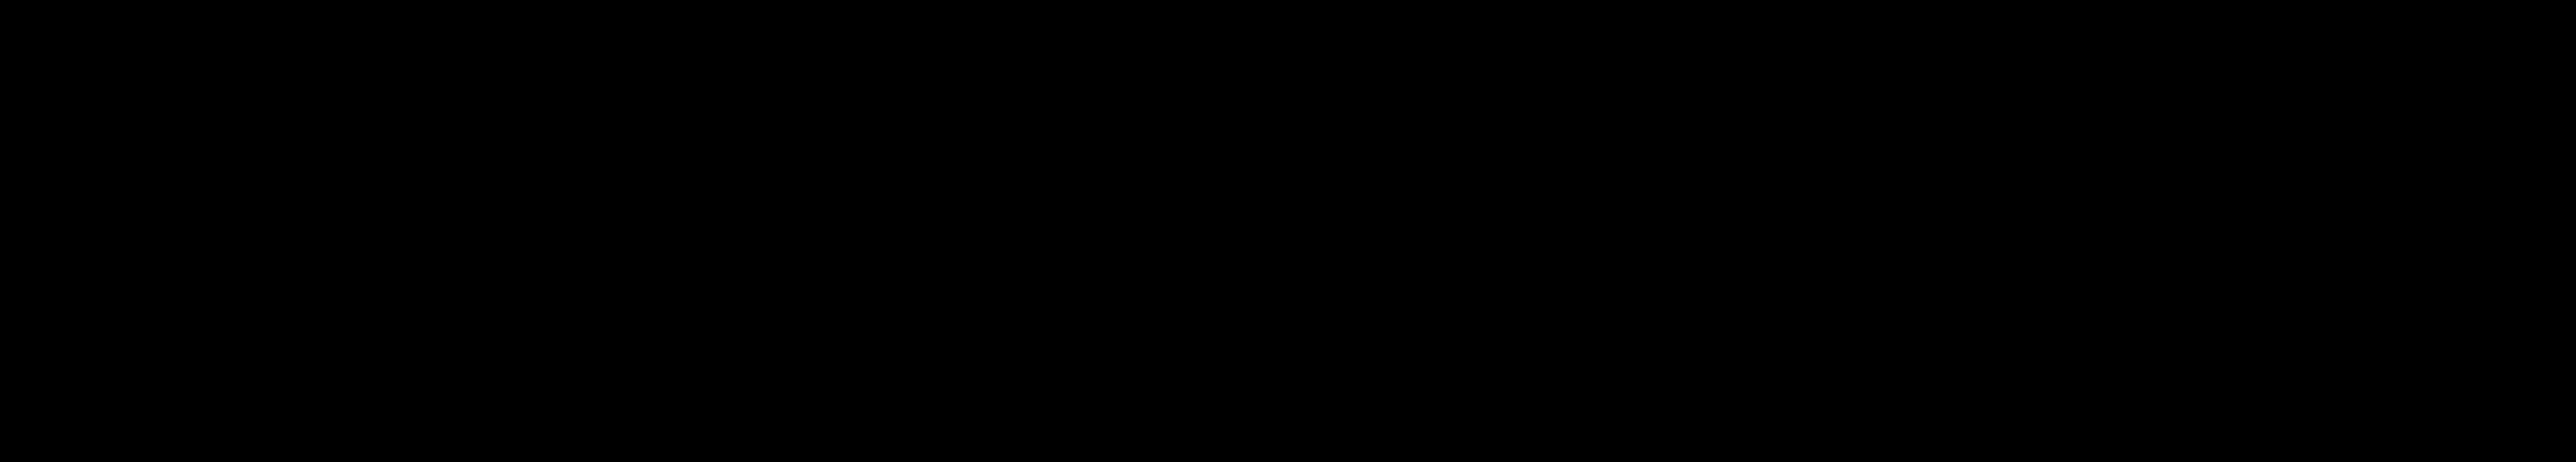 1-ROSILLO-PROJECTS-WHITE-V3